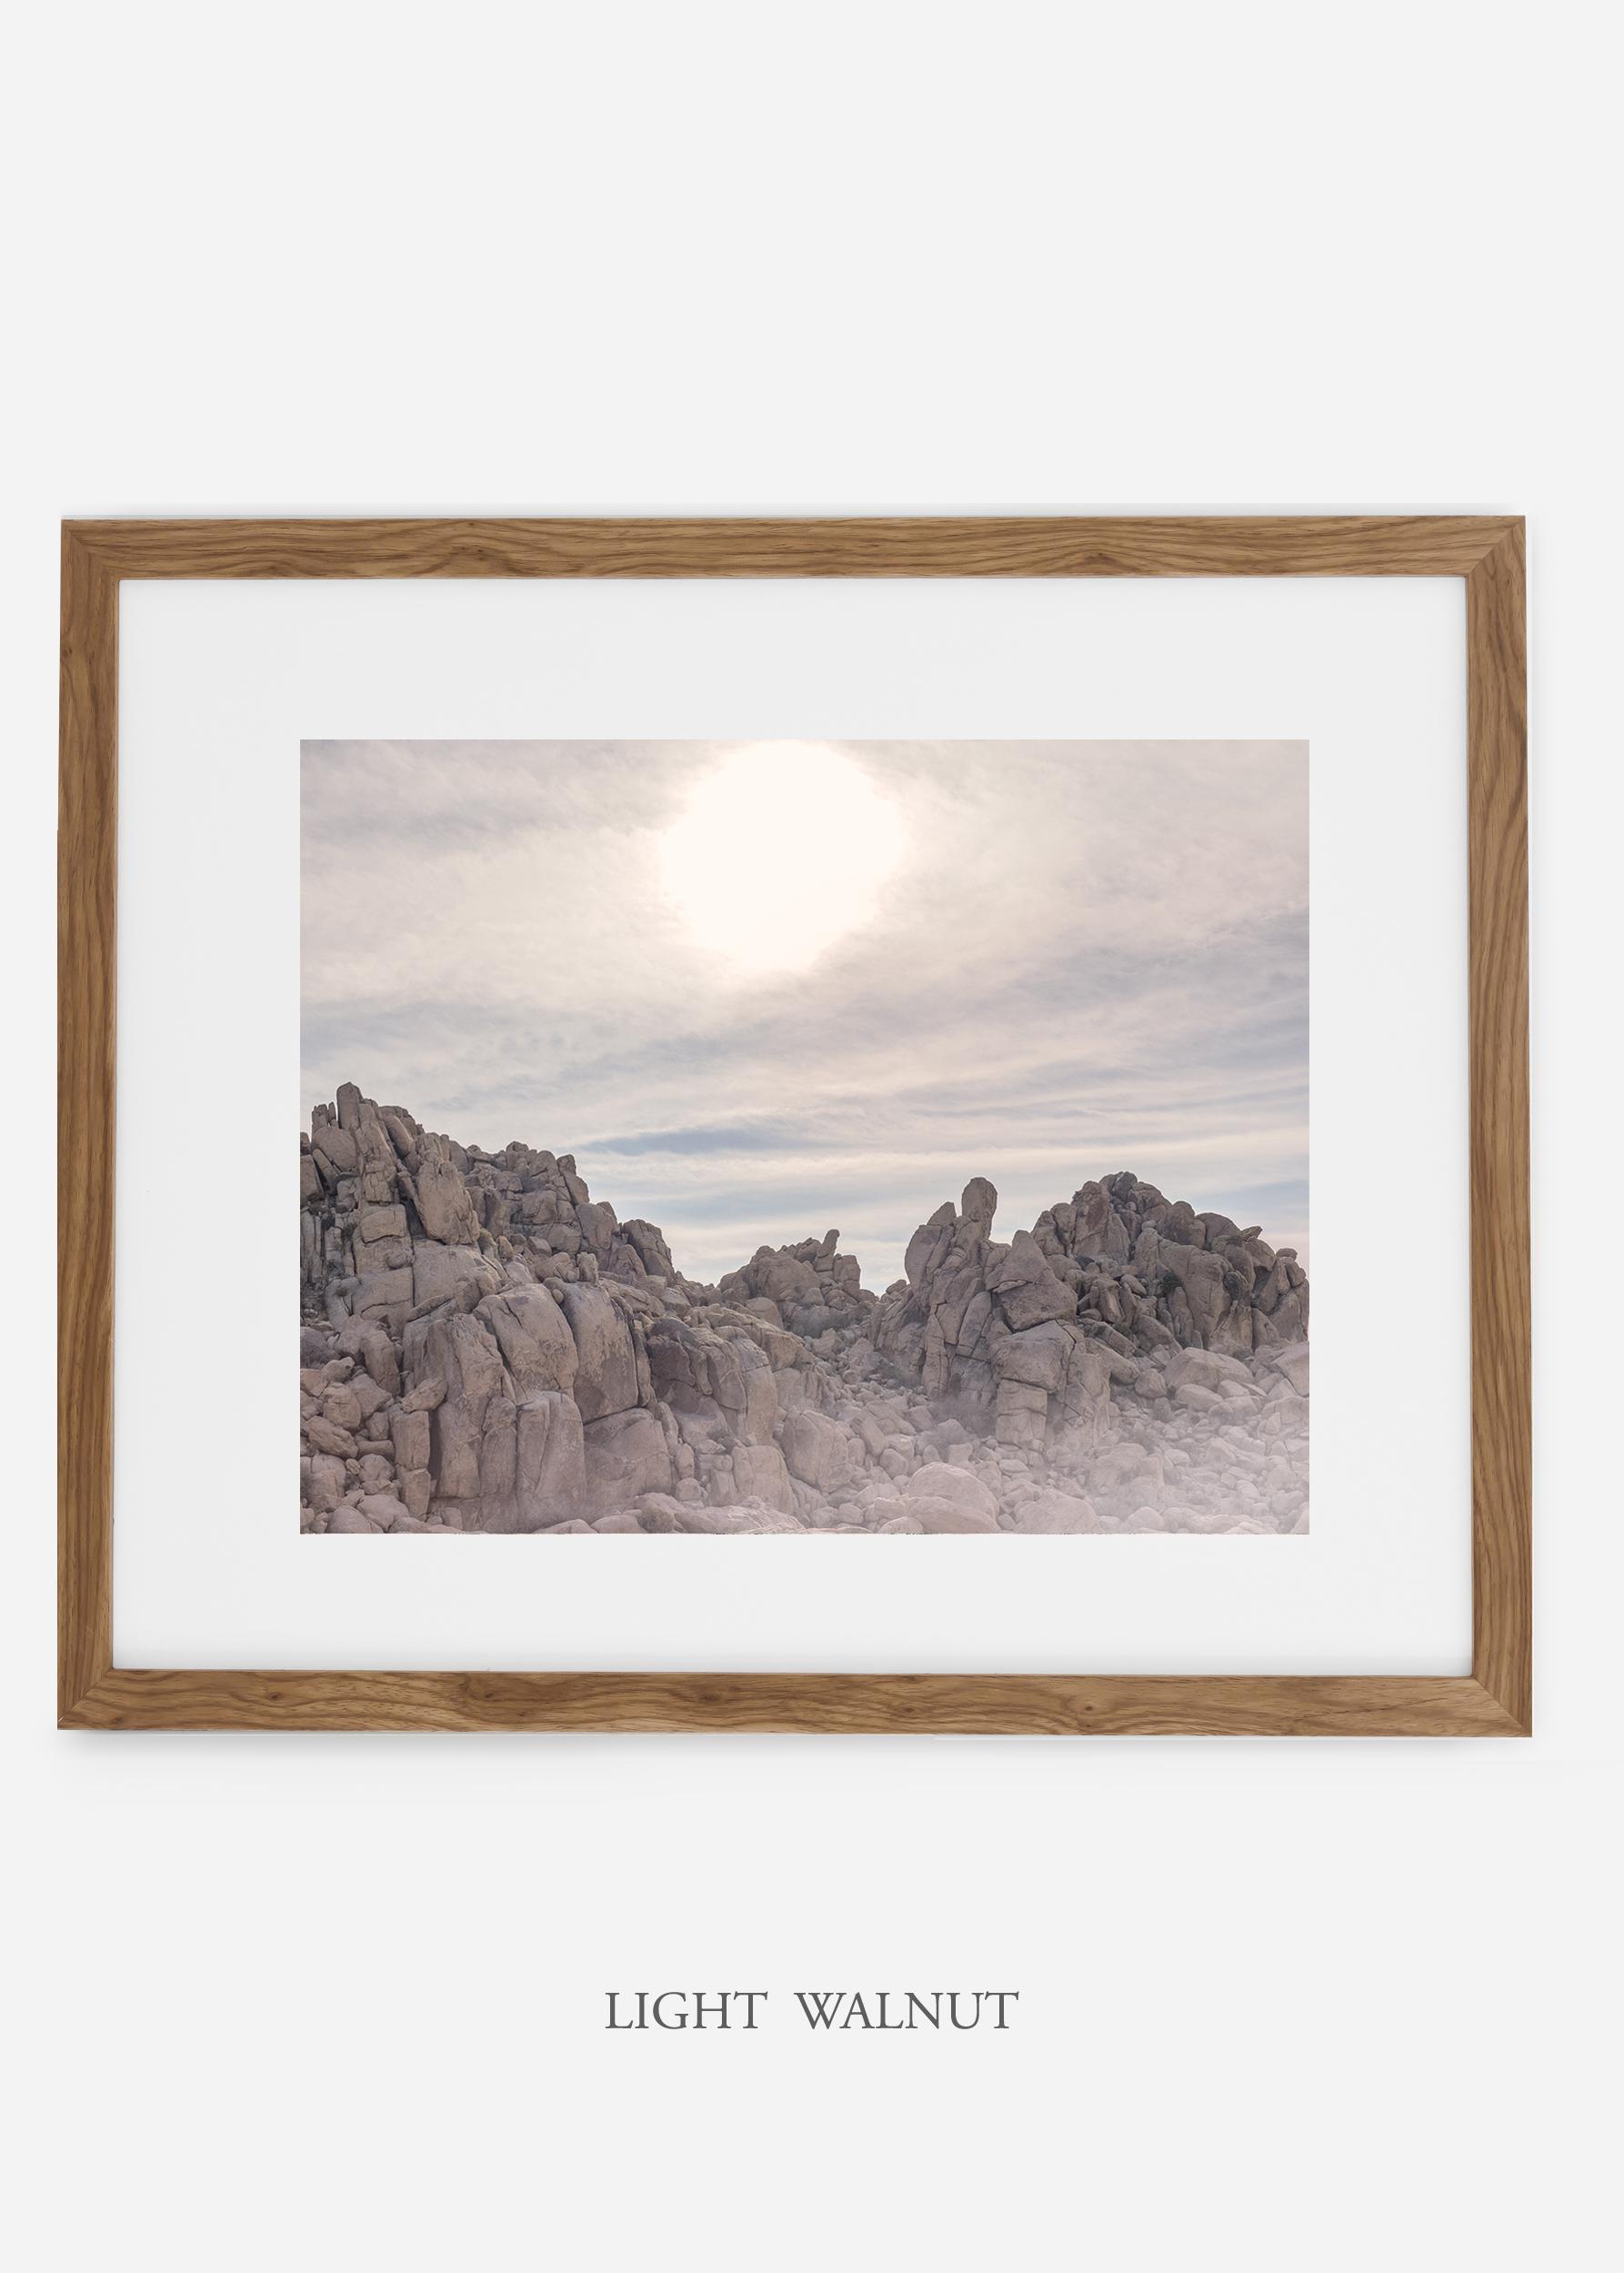 WilderCalifornia_lightwalnutframe_JoshuaTree_Rocks_No.3_interiordesign_desert_art.jpg